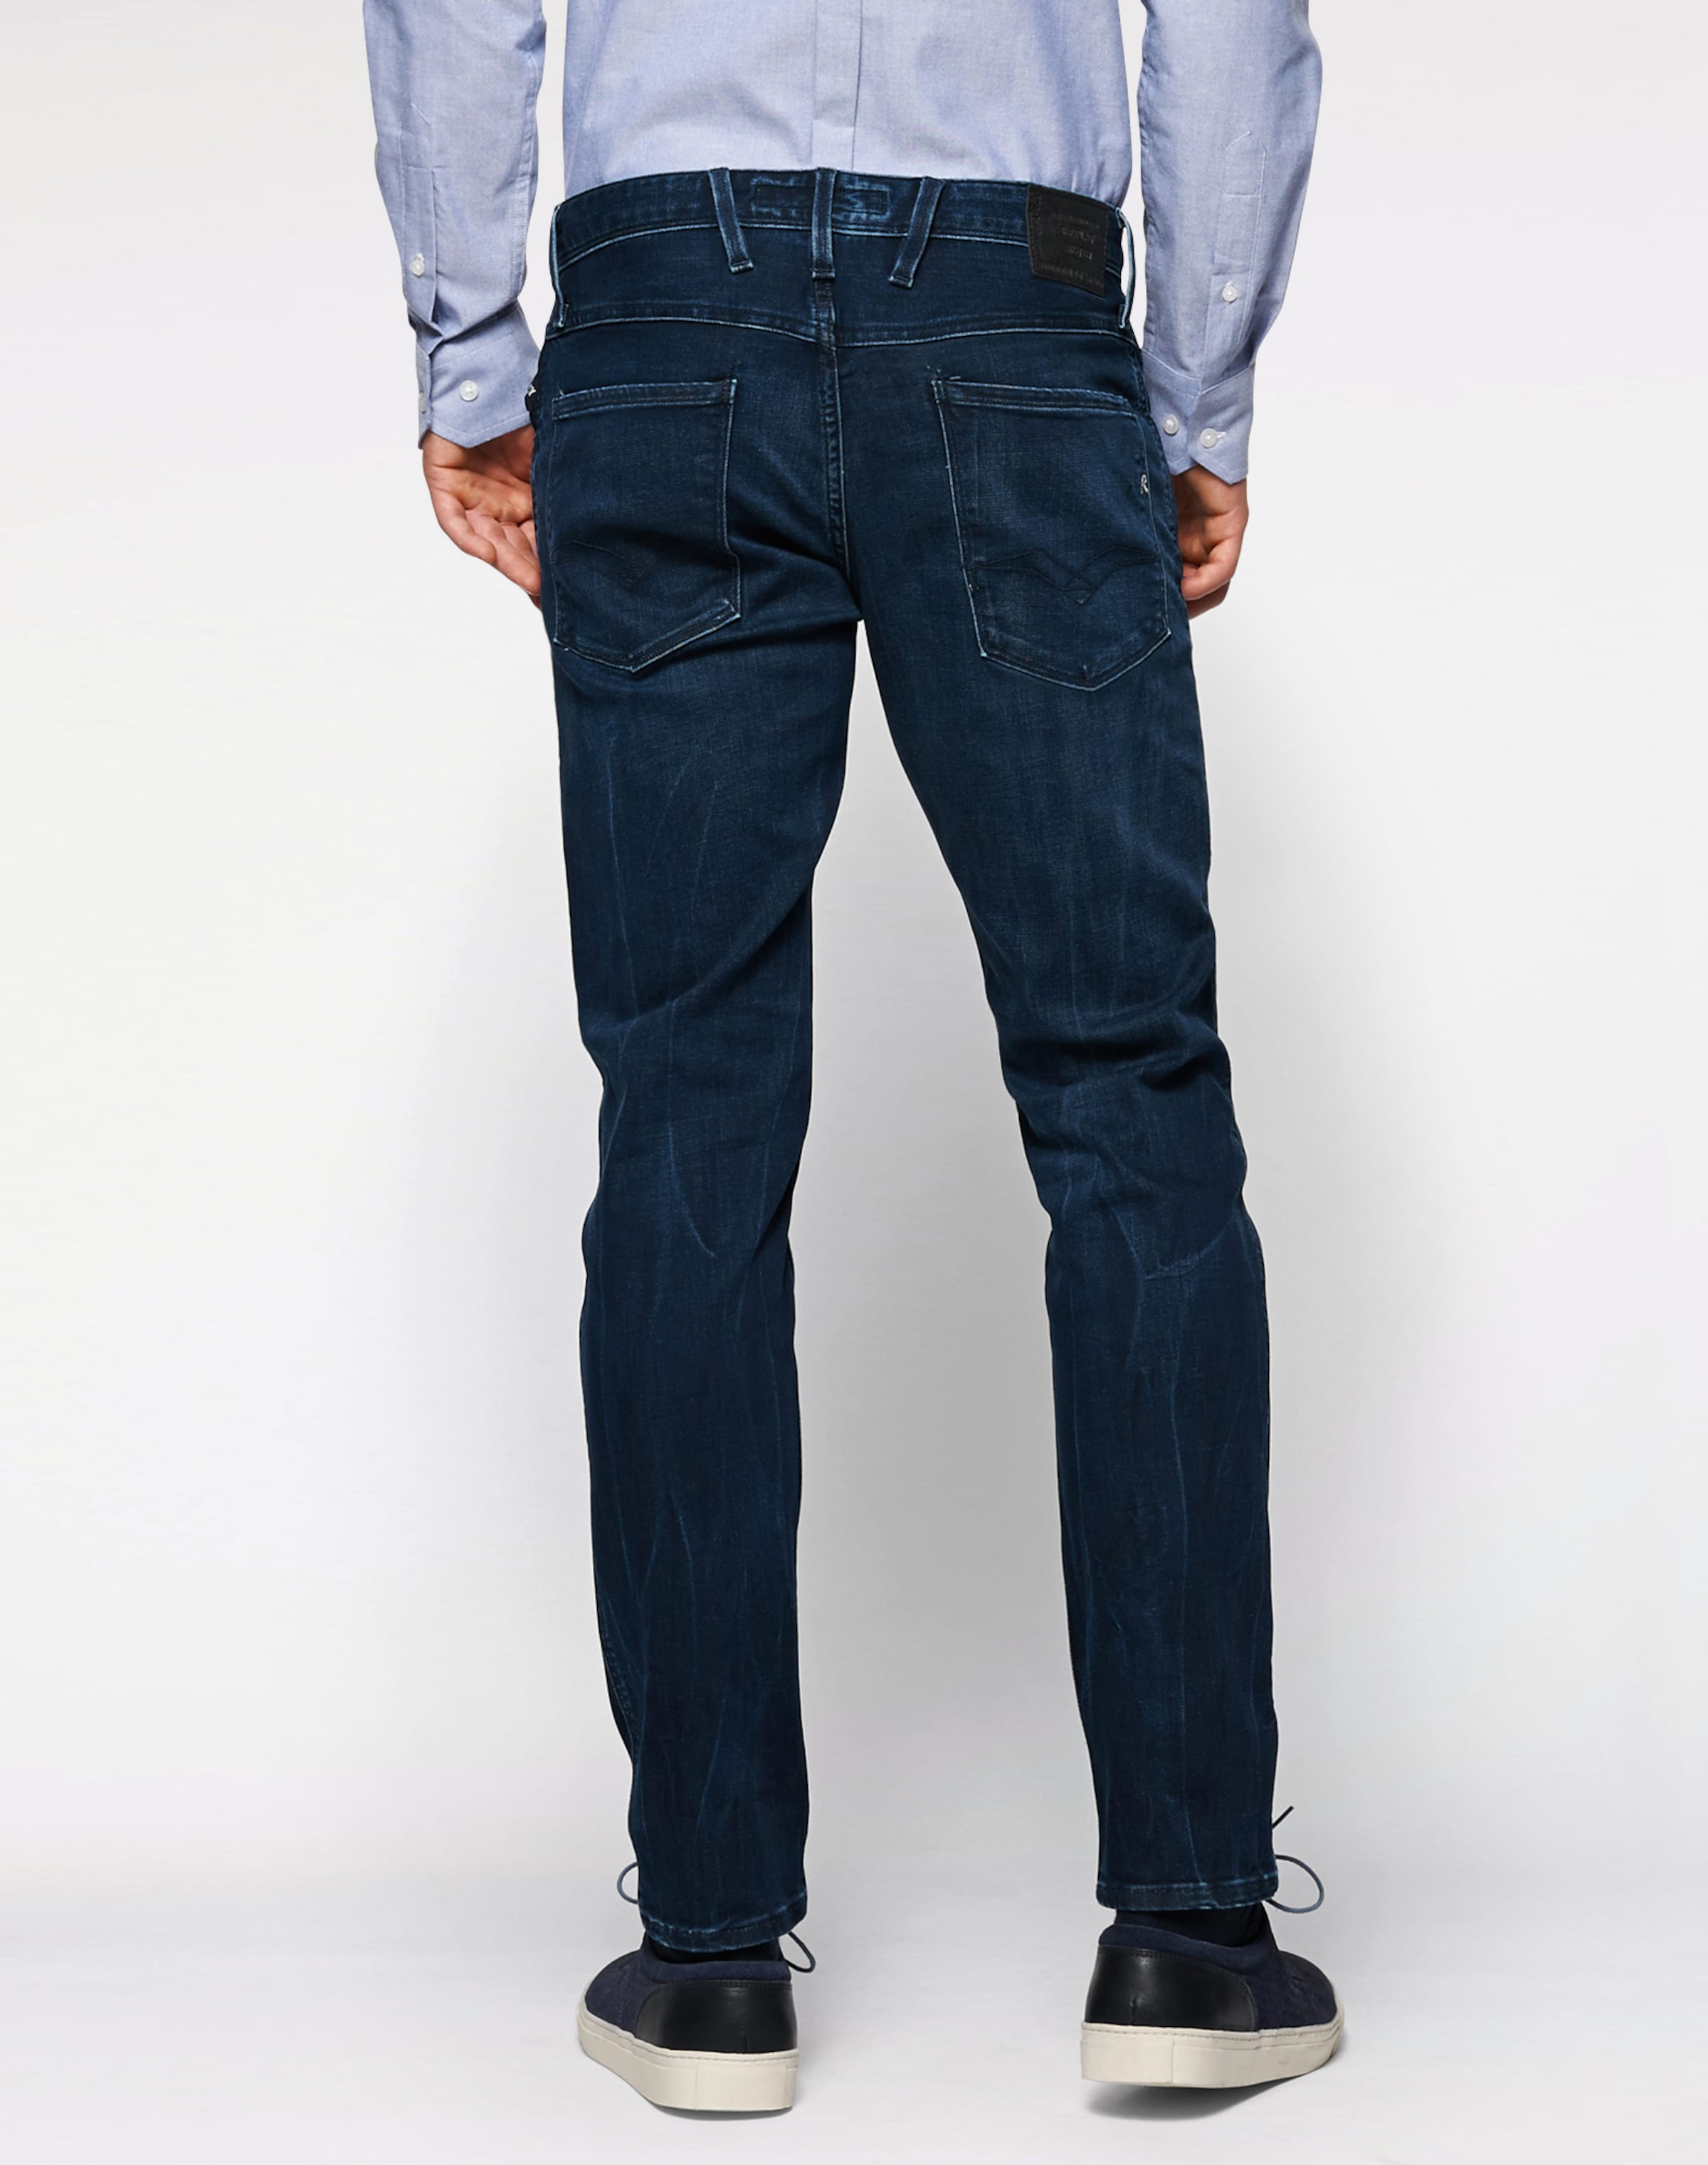 REPLAY Jeans im Used-Style 'Anbass' Günstige Kaufladen PJIqtPA